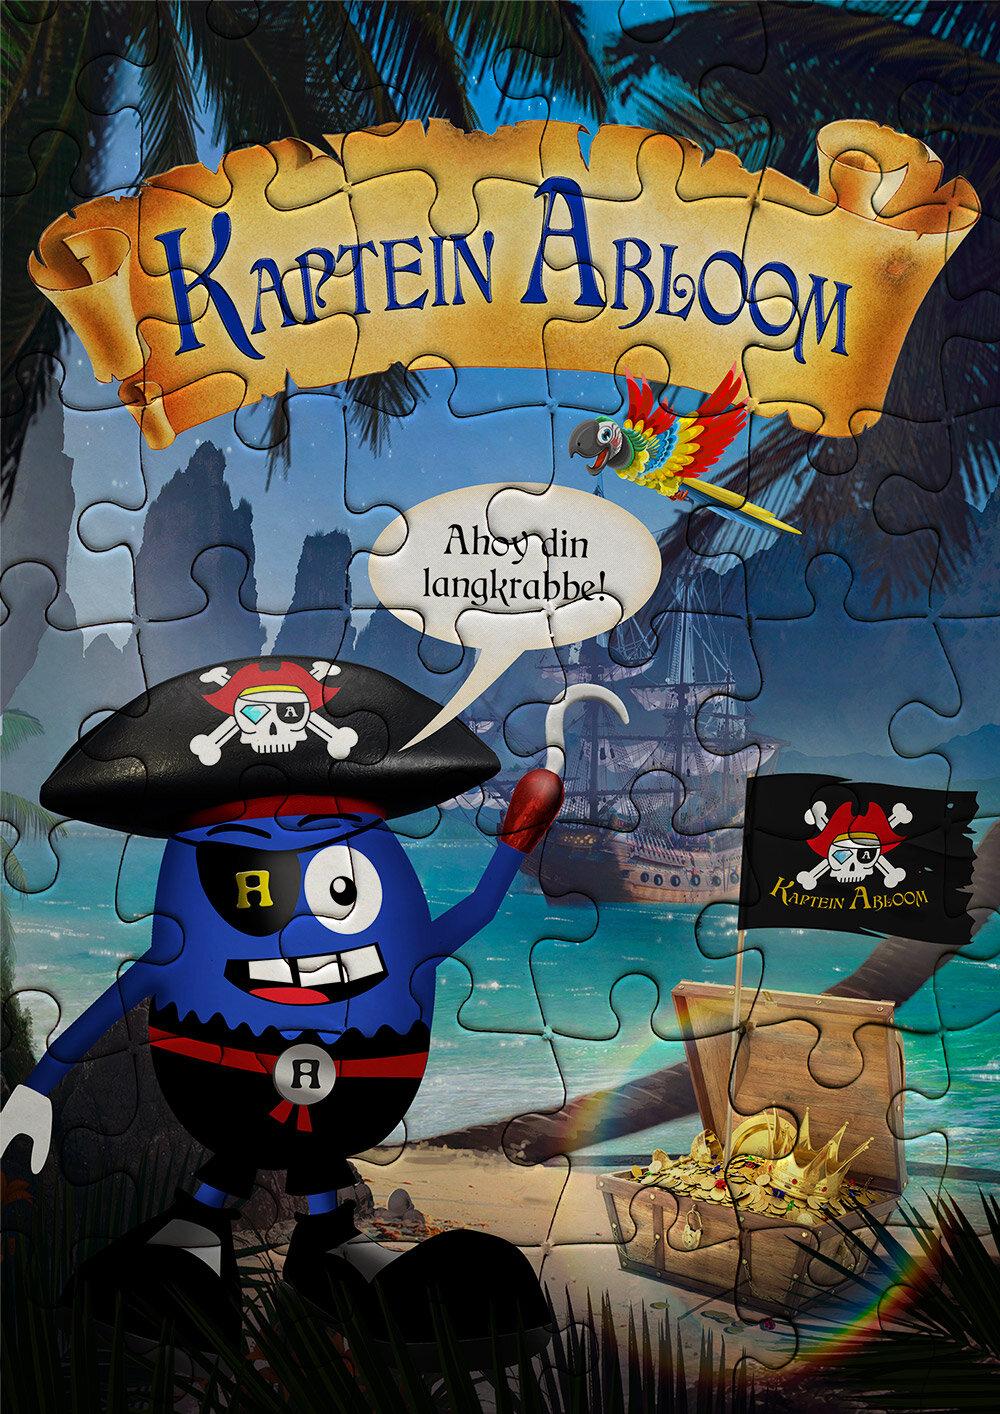 Kaptein Abloom fant skatten puslespill.jpg